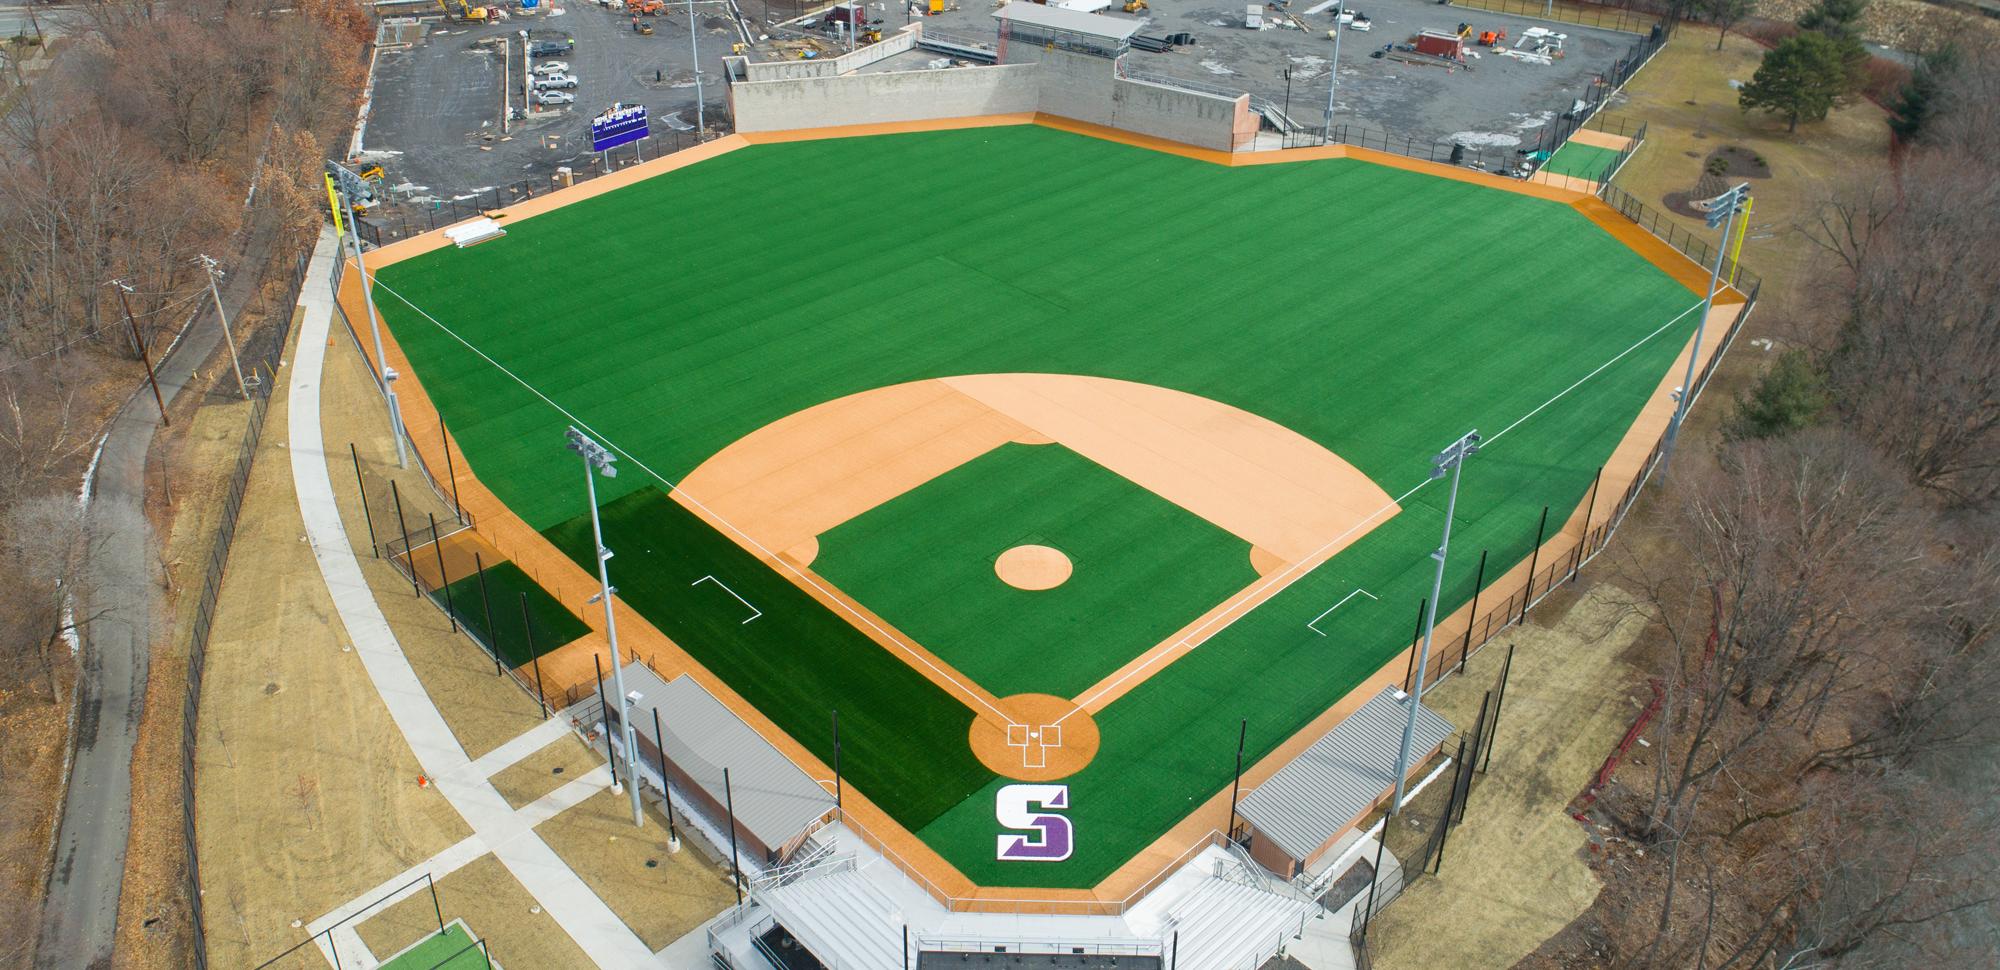 http://athletics.scranton.edu/Facilities/Kevin_P._Quinn-_S.J._Athletics_Campus/Construction/Update_2-17-18/Baseball_web.jpg